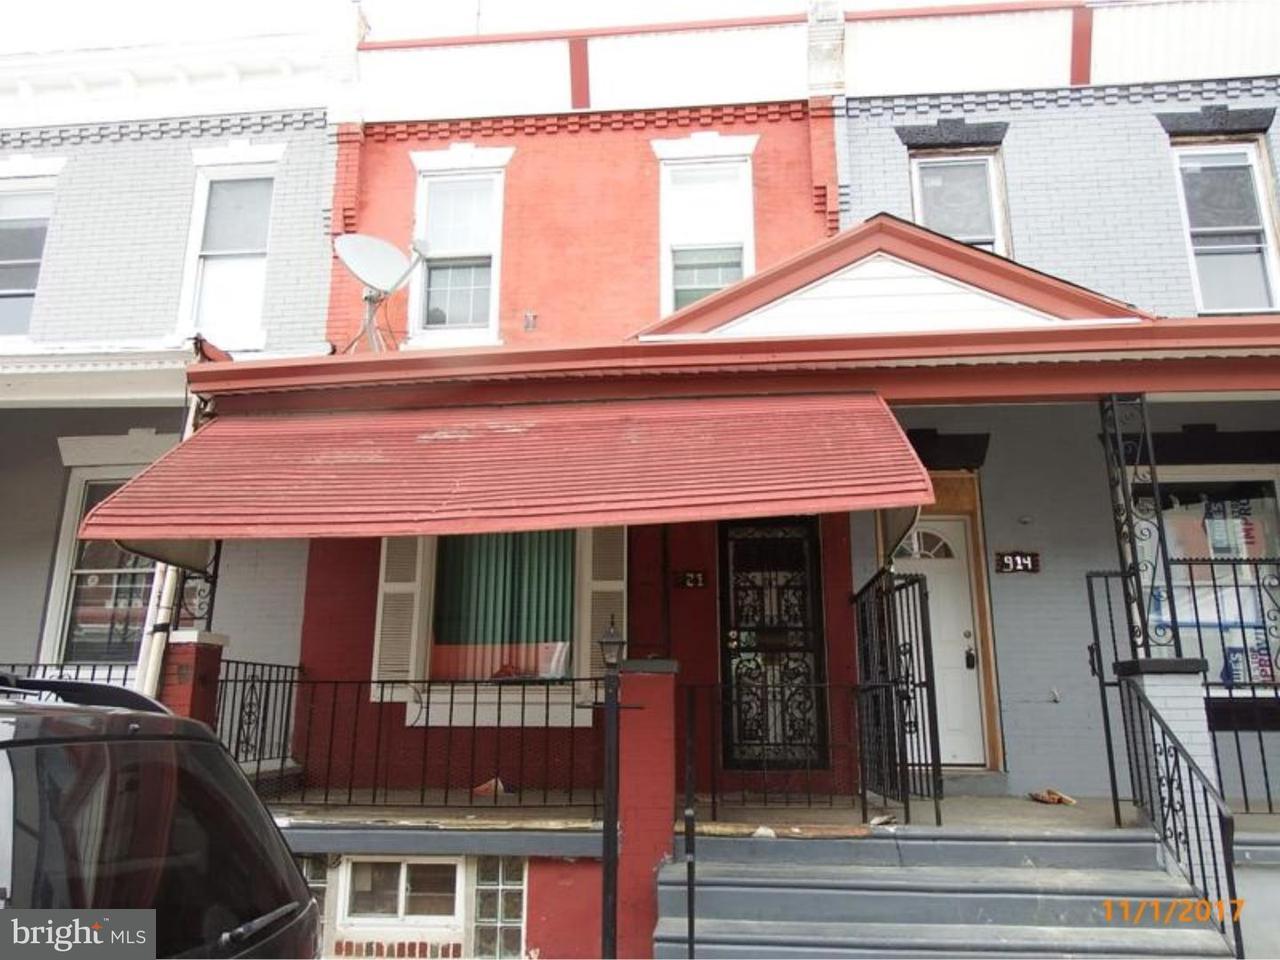 921 N Saint Bernard Philadelphia, PA 19131